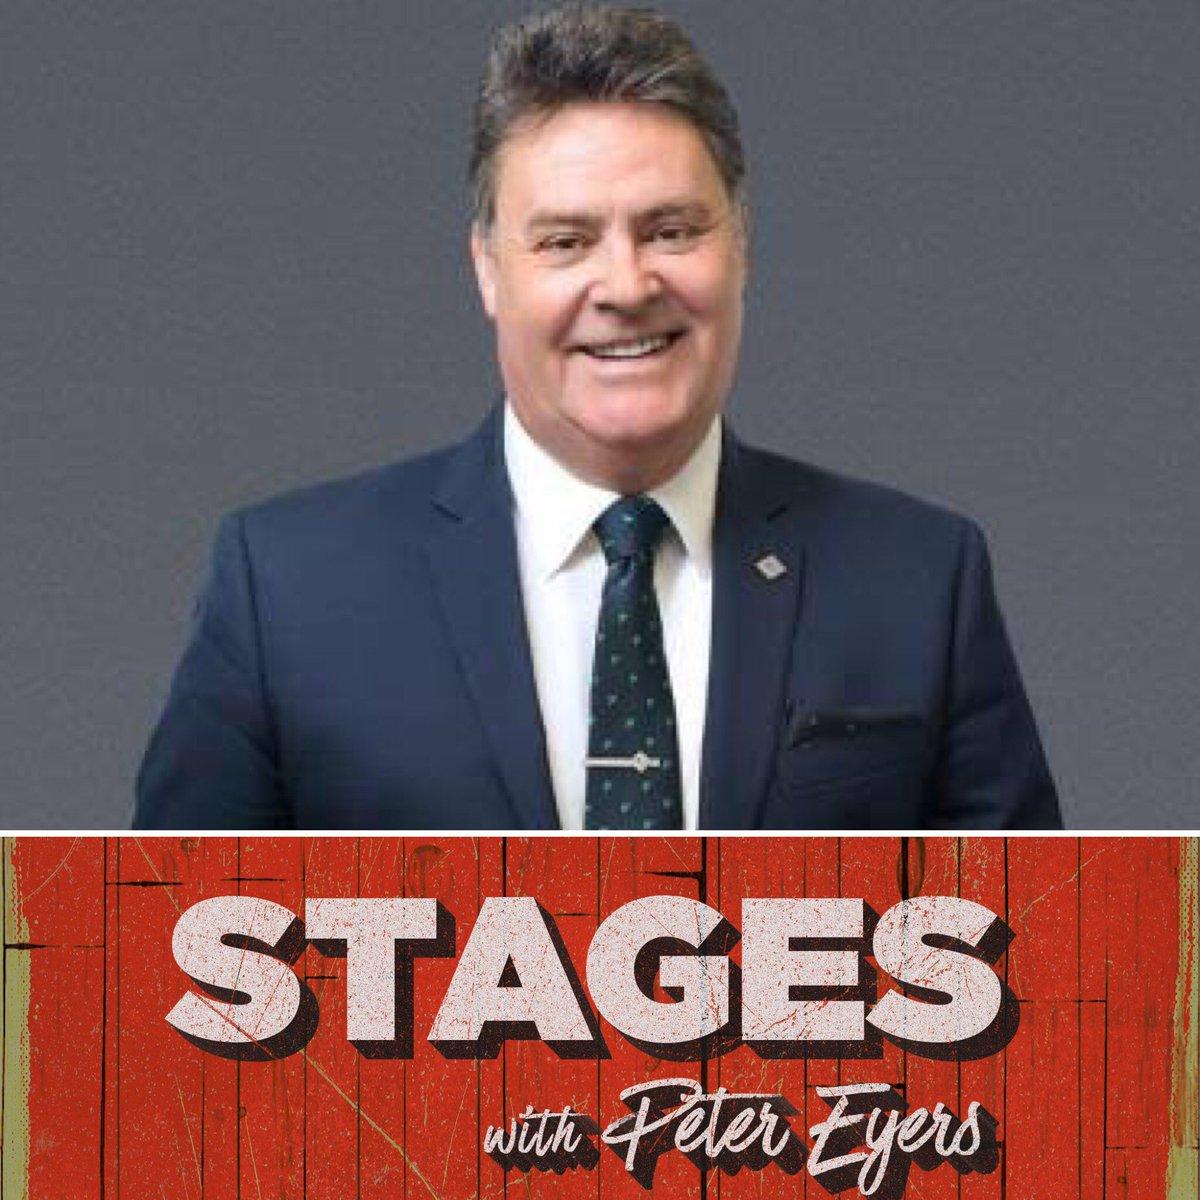 STAGES with Peter Eyers - Opera Singer  - Roger Lemke https://t.co/eTZSz4amXQ via @whooshkaa @PeterEyers #stages #opera https://t.co/JpsGhqlSJQ